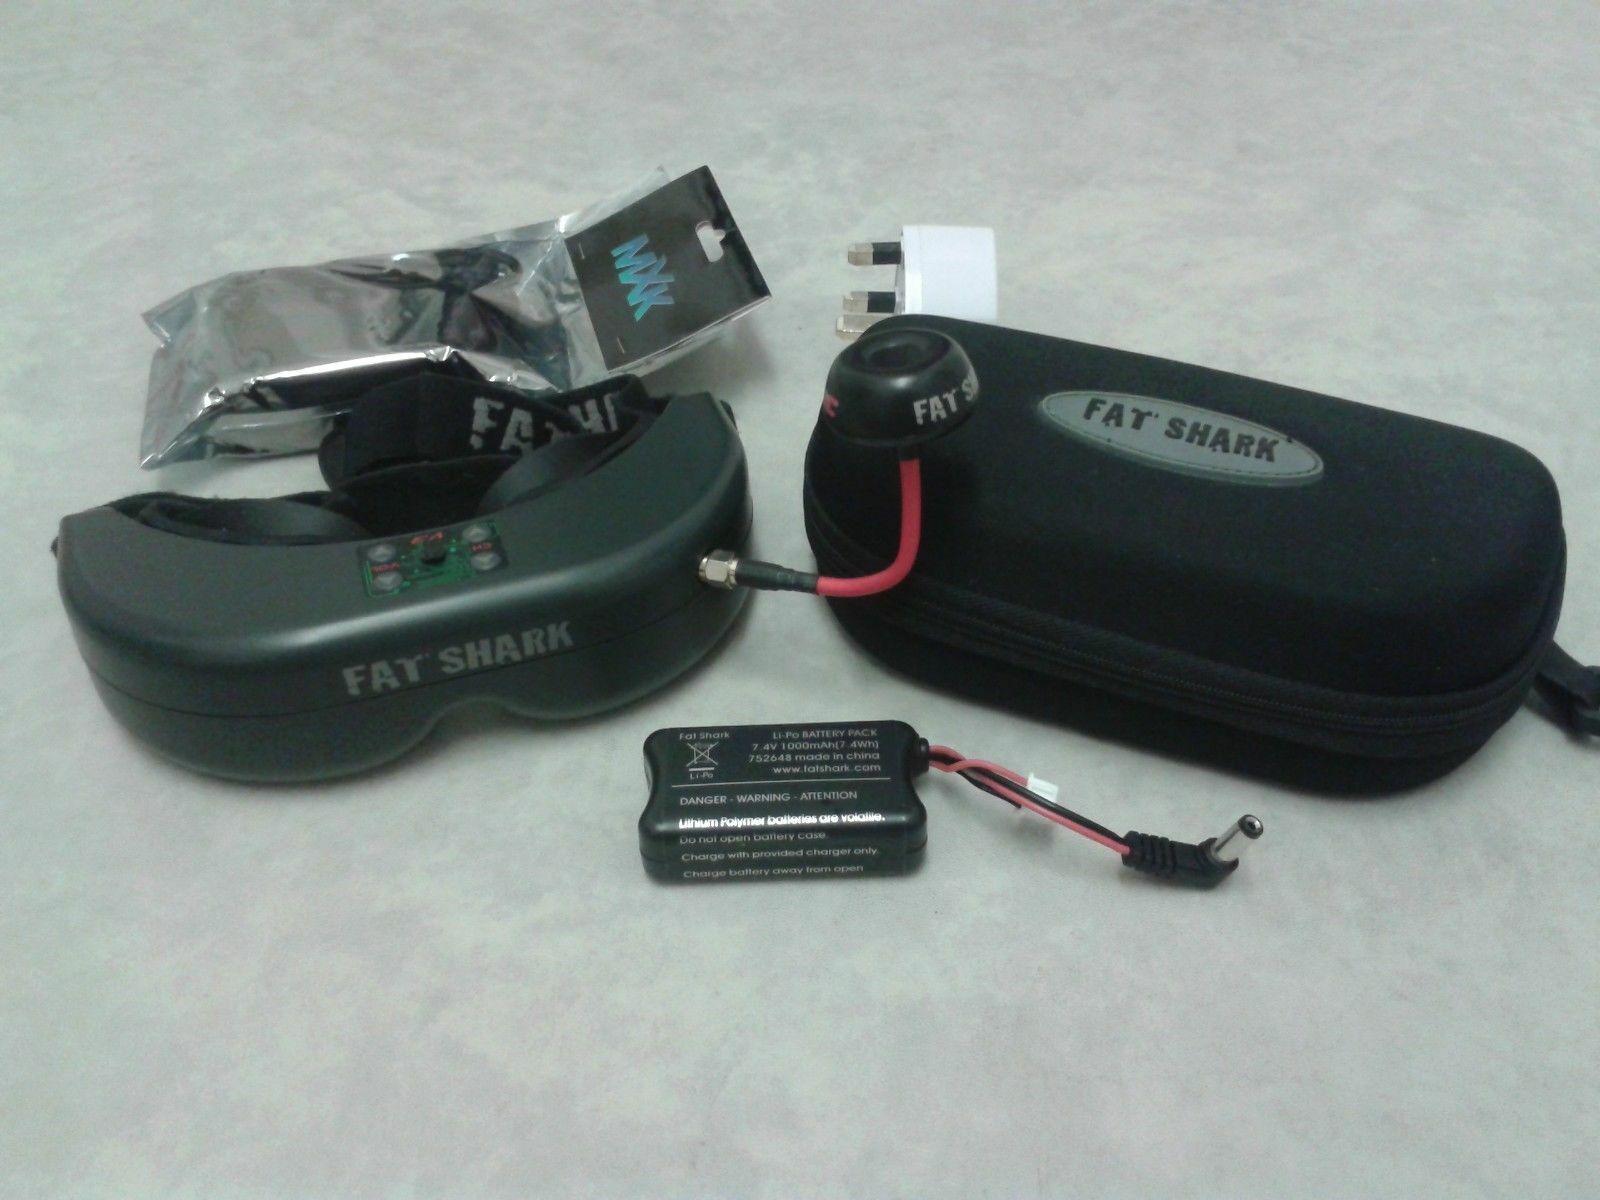 FatShark Teleporter V3 Fpv Gafas 5.8GHz Cargador RC Racing Drone plano de cuatro